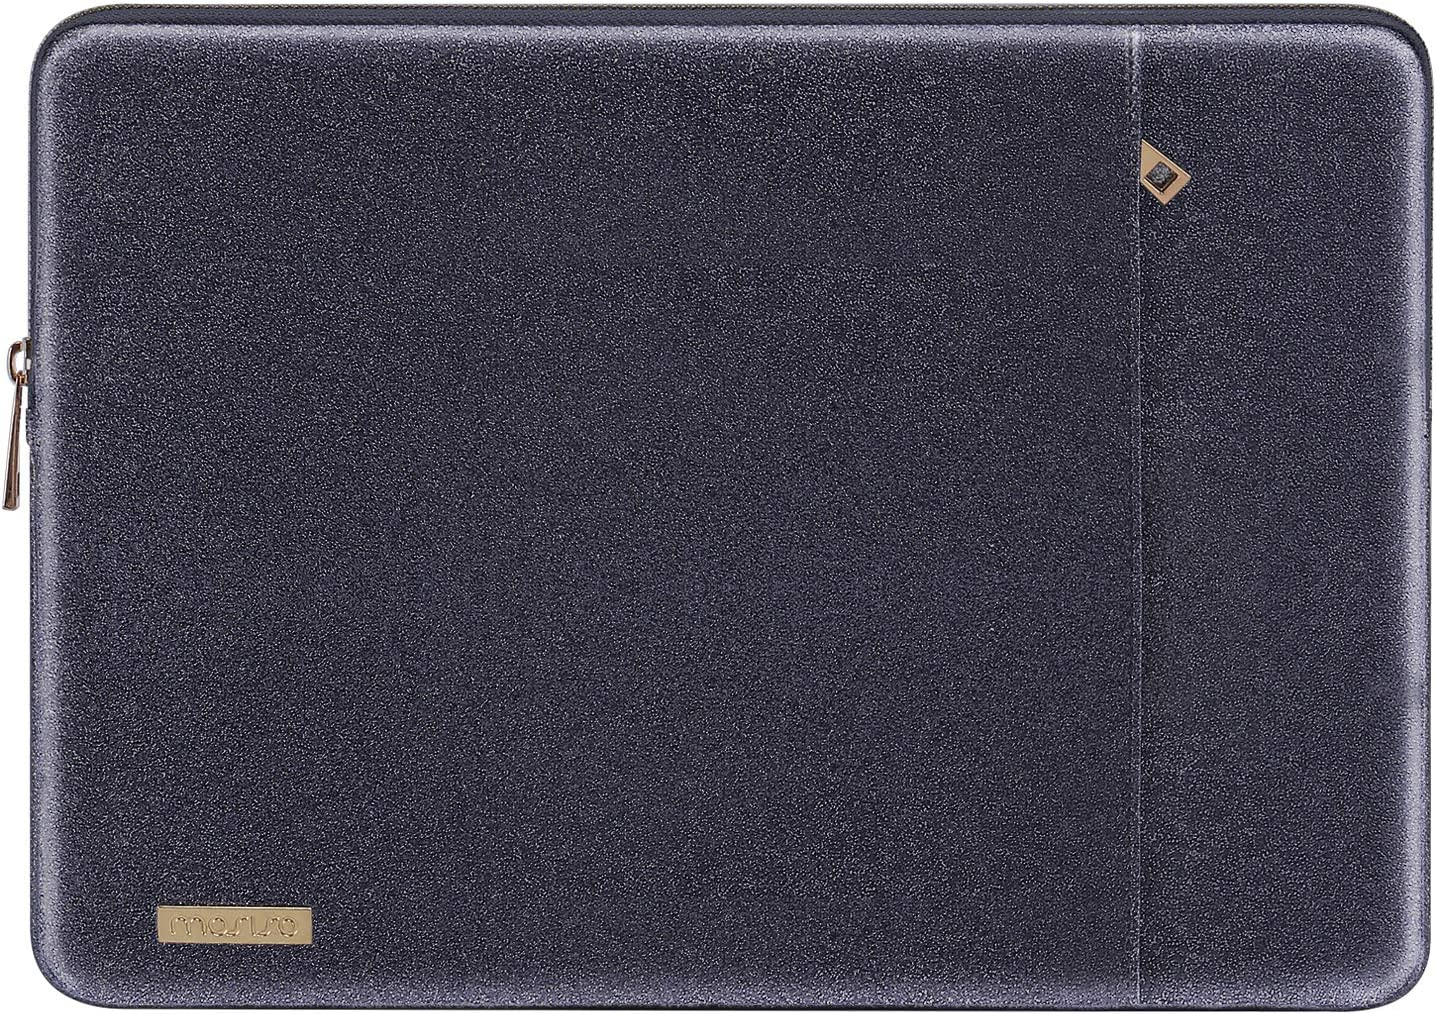 MOSISO Funda Protectora Compatible con 13-13.3 Pulgadas MacBook Pro Retina/MacBook Air/Surface Laptop 2 2018 2017/Surface Book,PU Estuche Acolchado de Estilo Vertical Bolsa Impermeable,Gris Espacial: Amazon.es: Electrónica